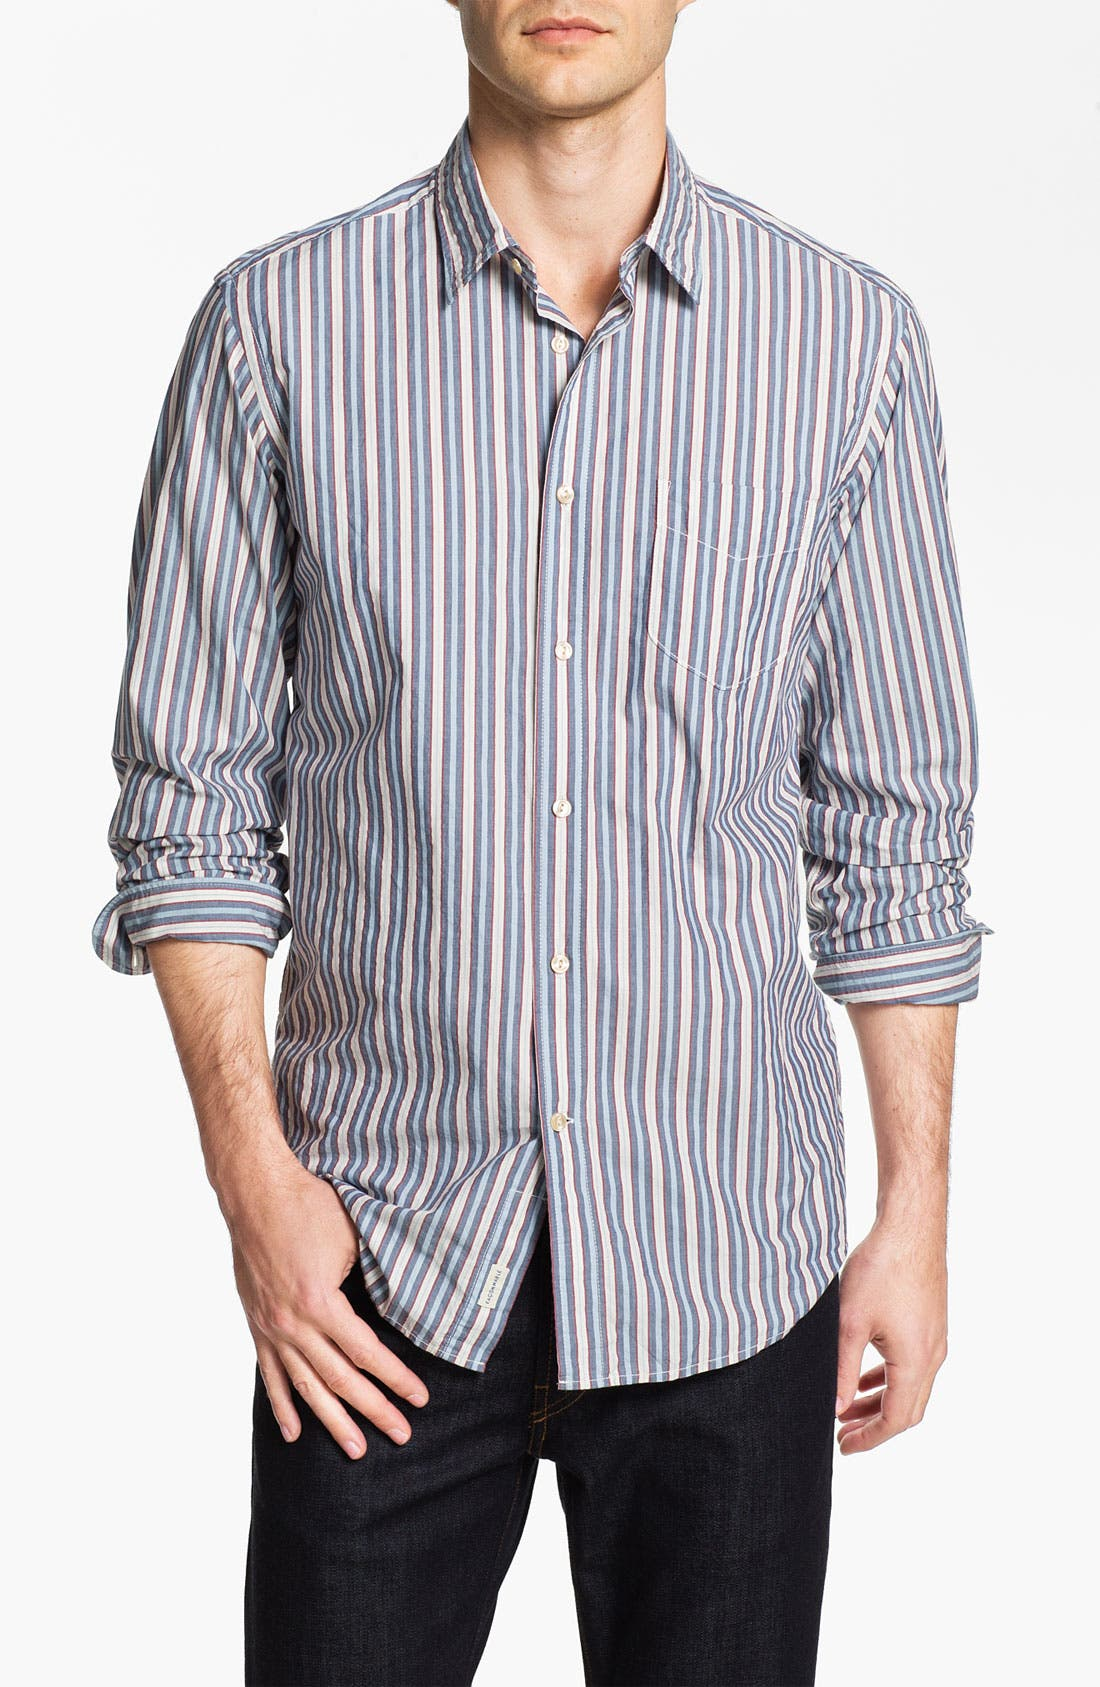 Alternate Image 1 Selected - Façonnable Tailored Denim Regular Fit Sport Shirt